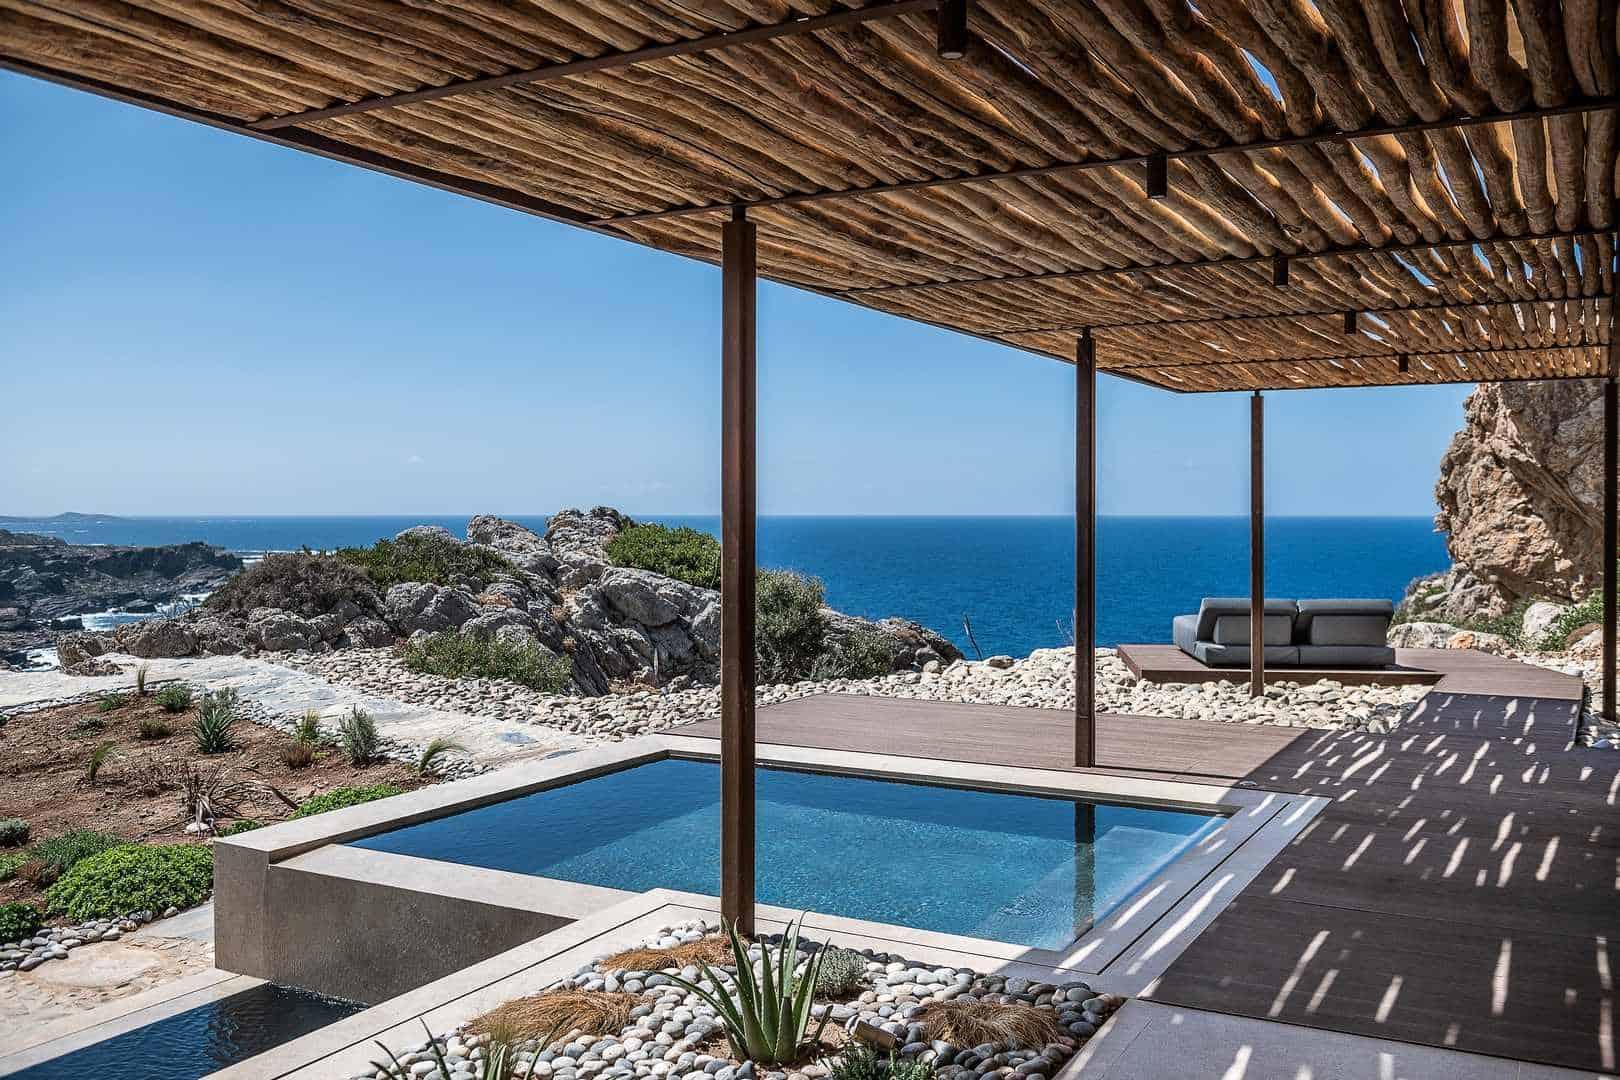 Sunbed with a view – villa San Matteo